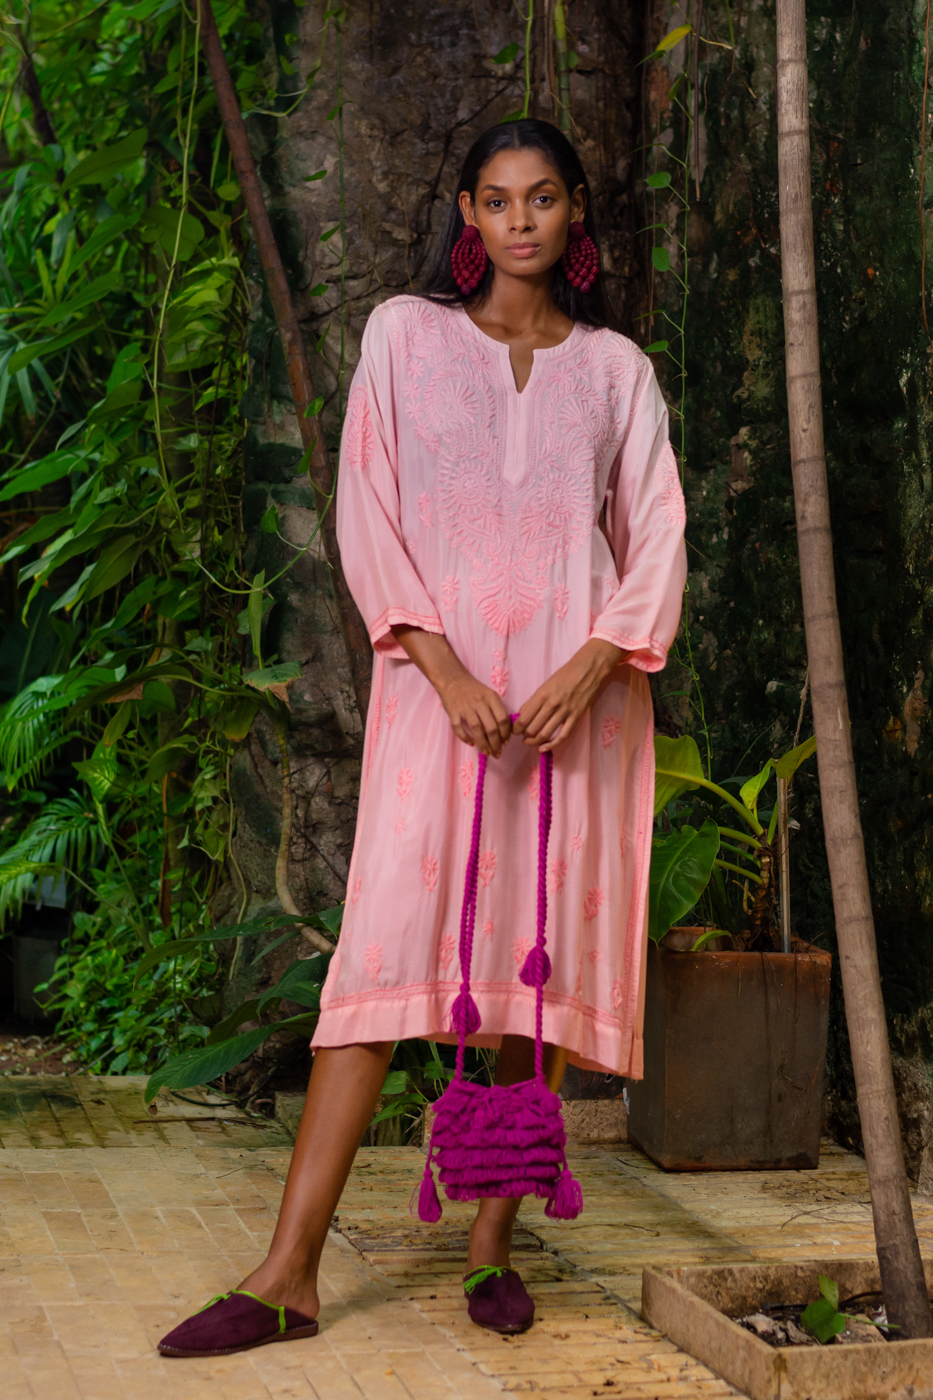 Kurta dress in traditional Indian pink cotton